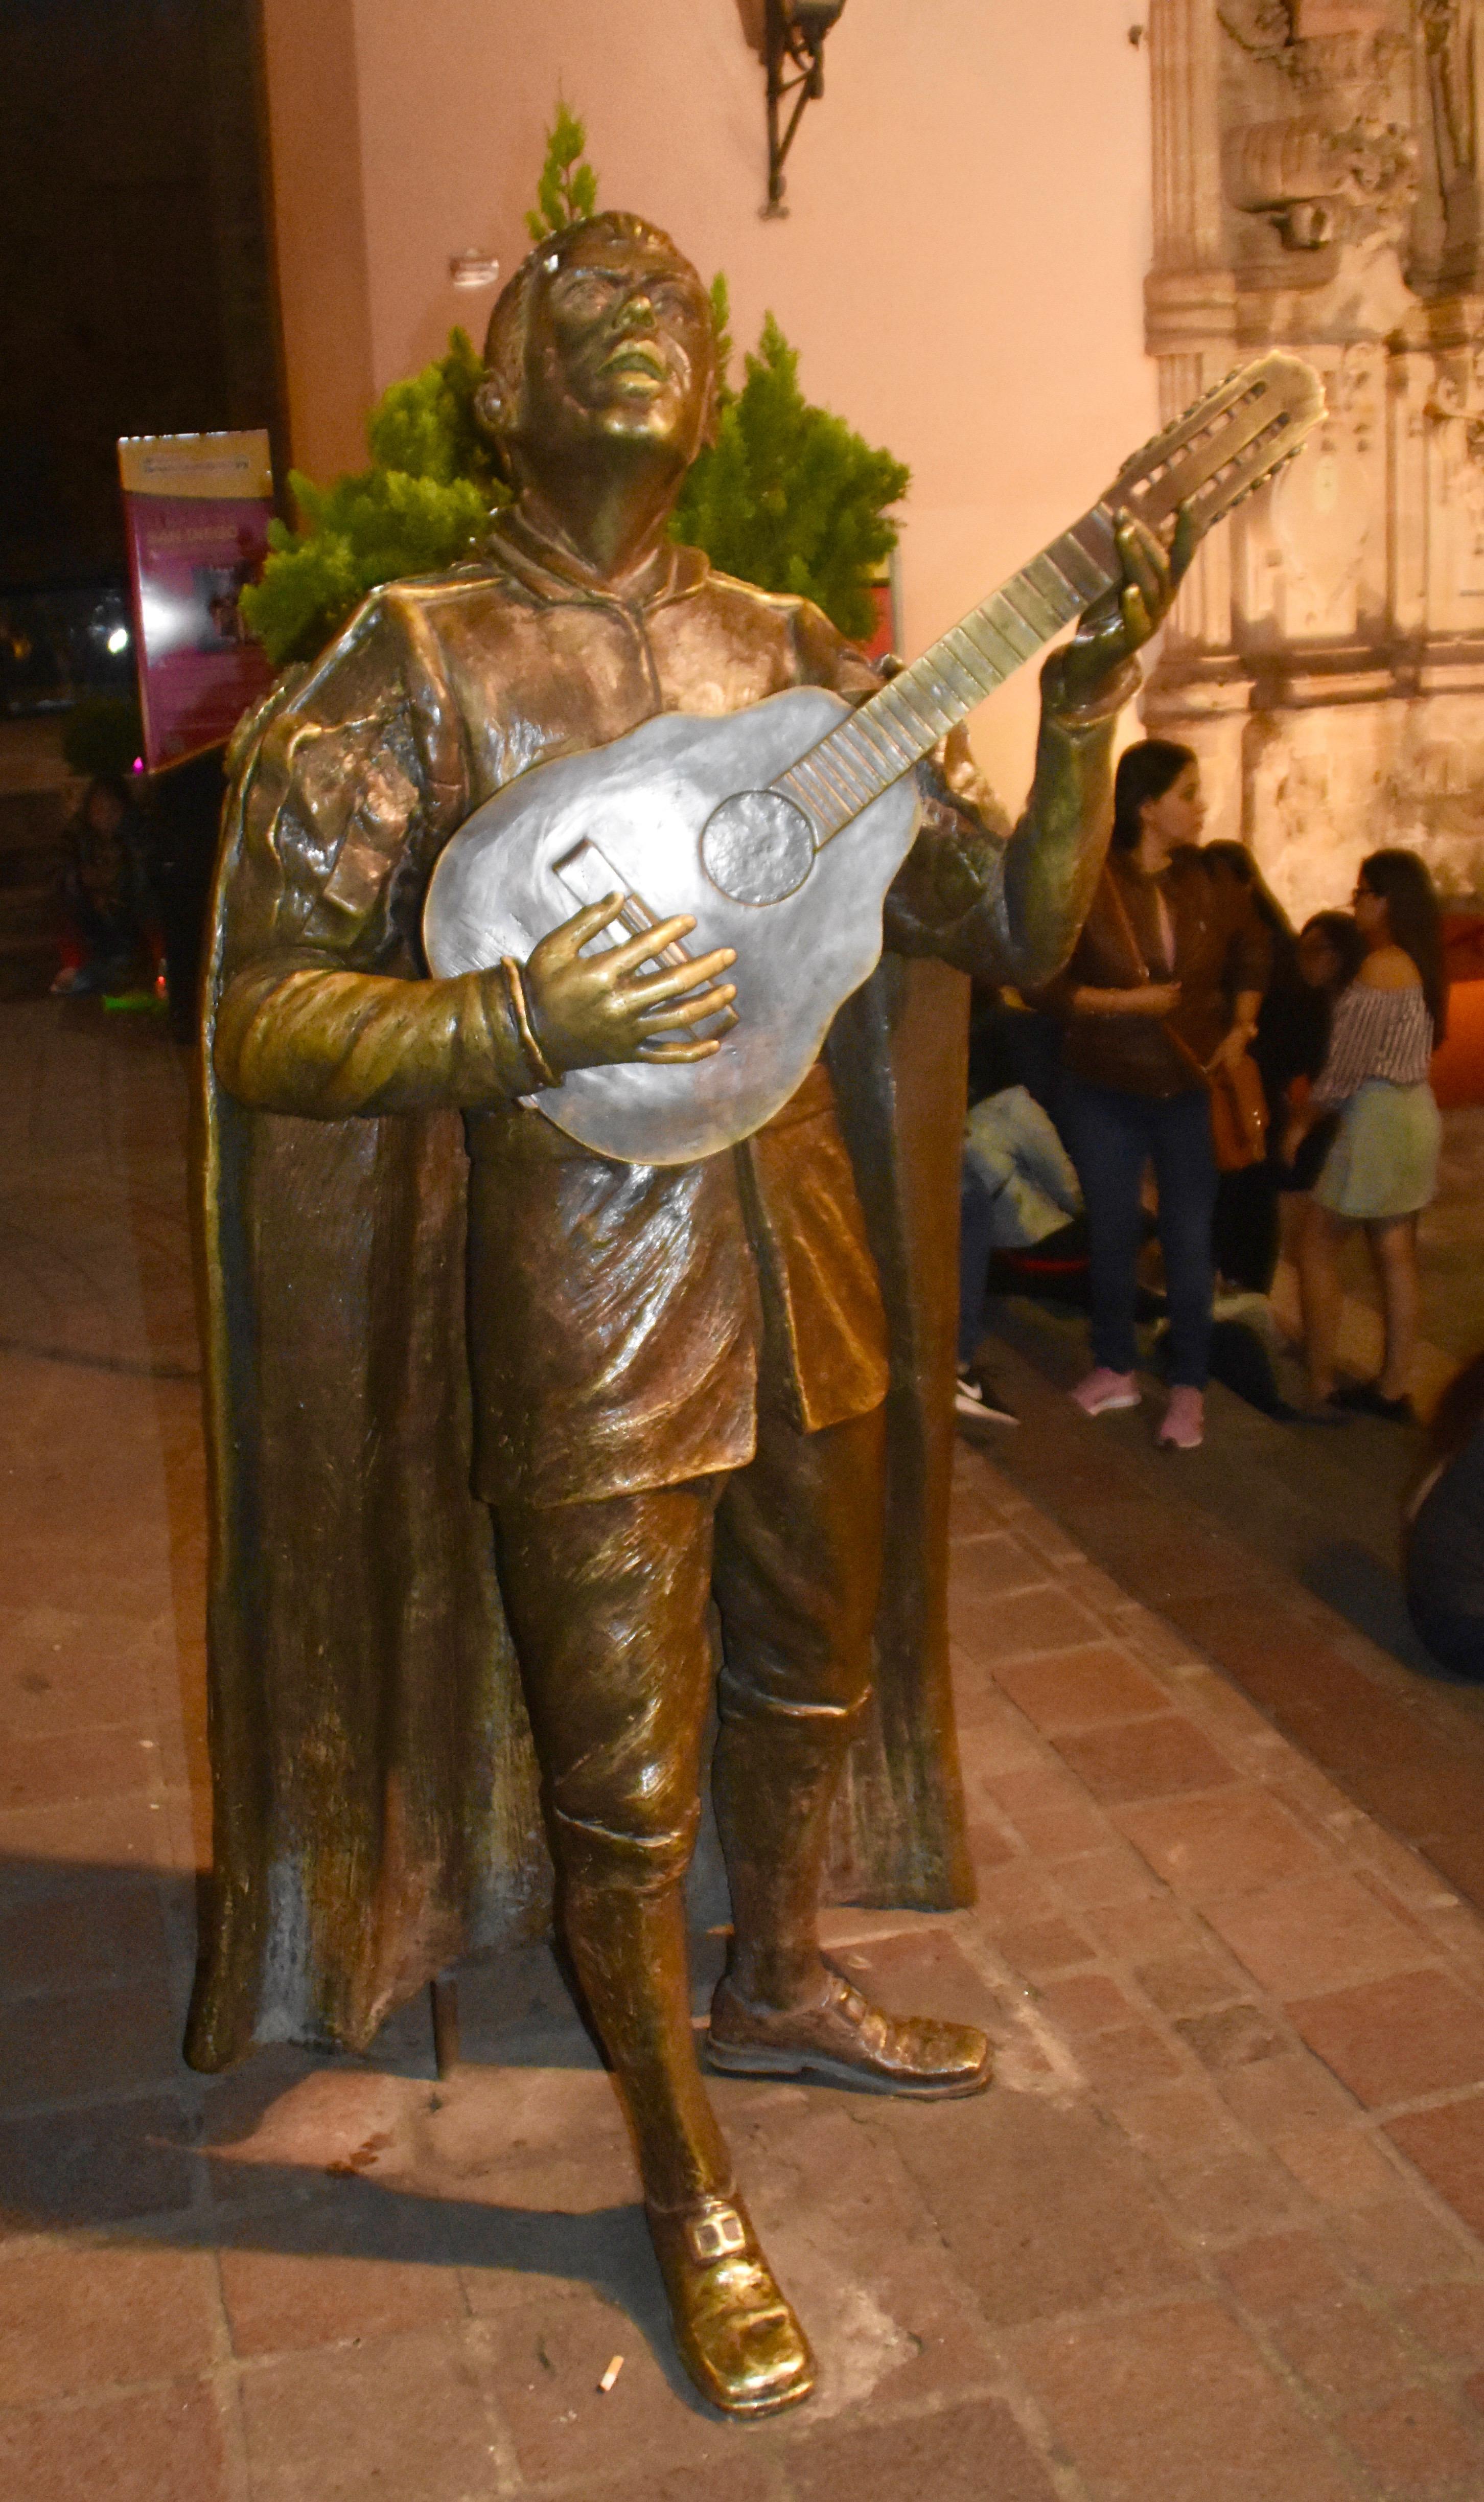 Troubador Statue, Guanajuato